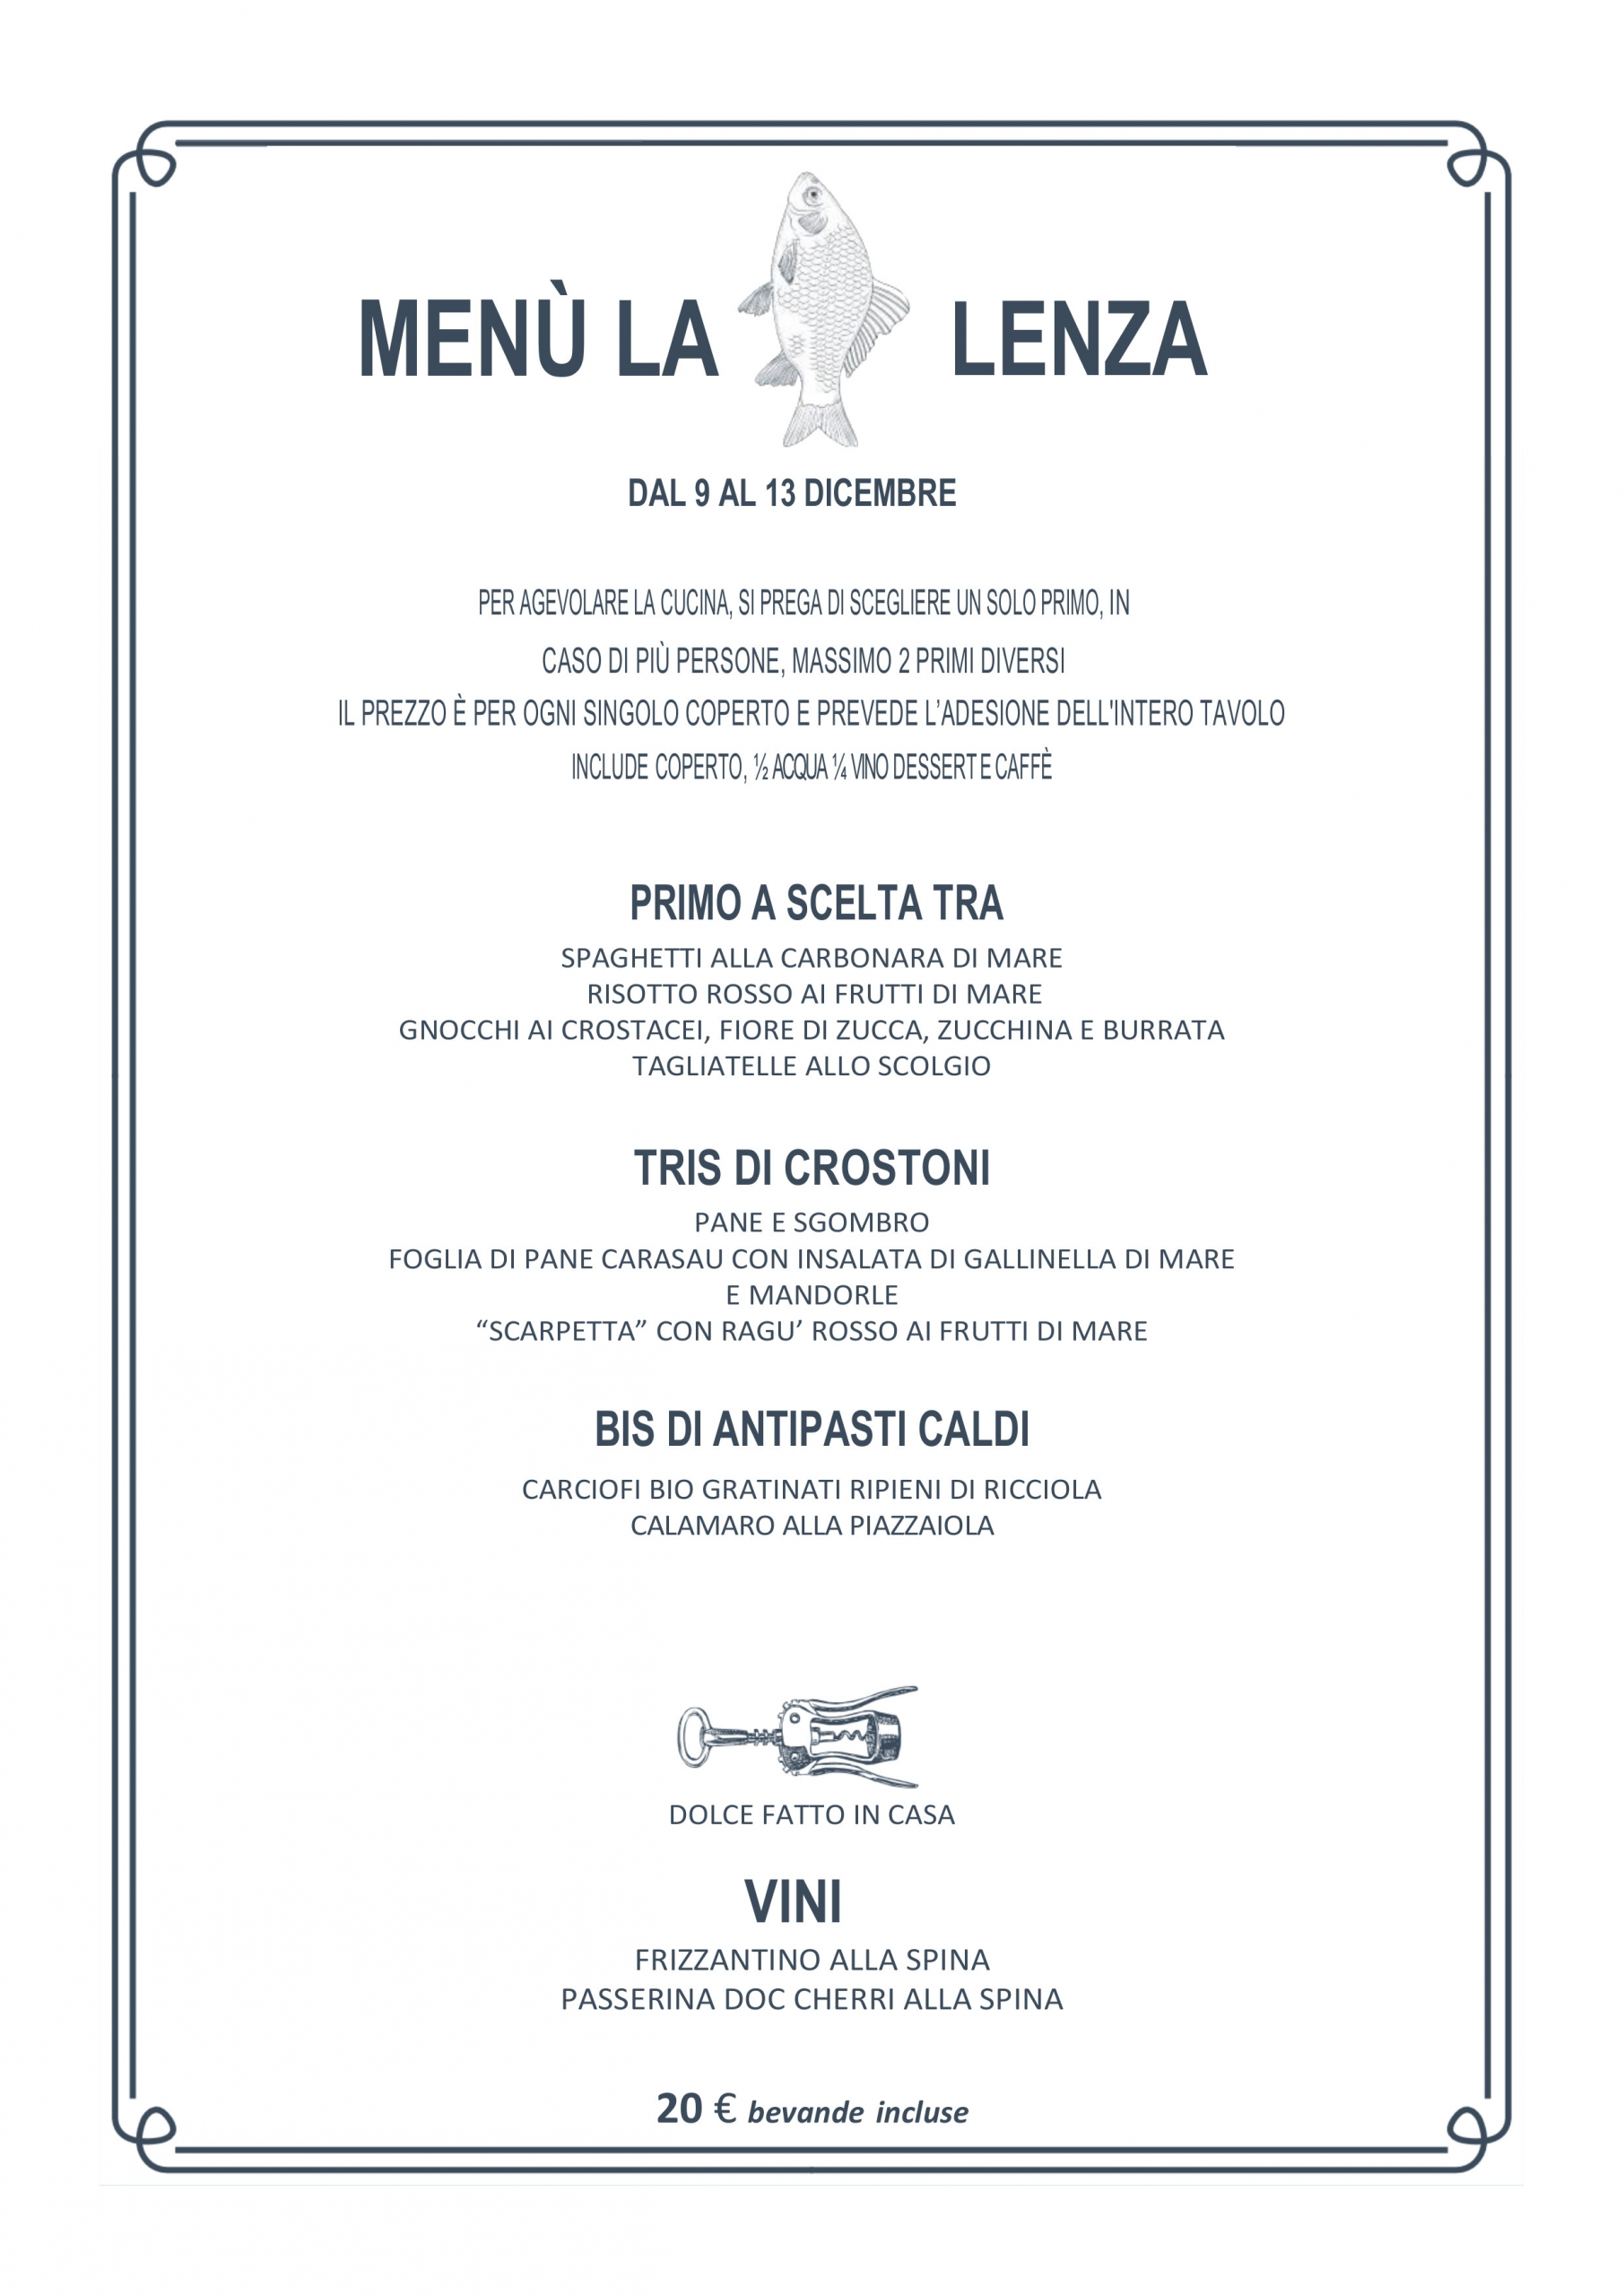 Menù Lenza